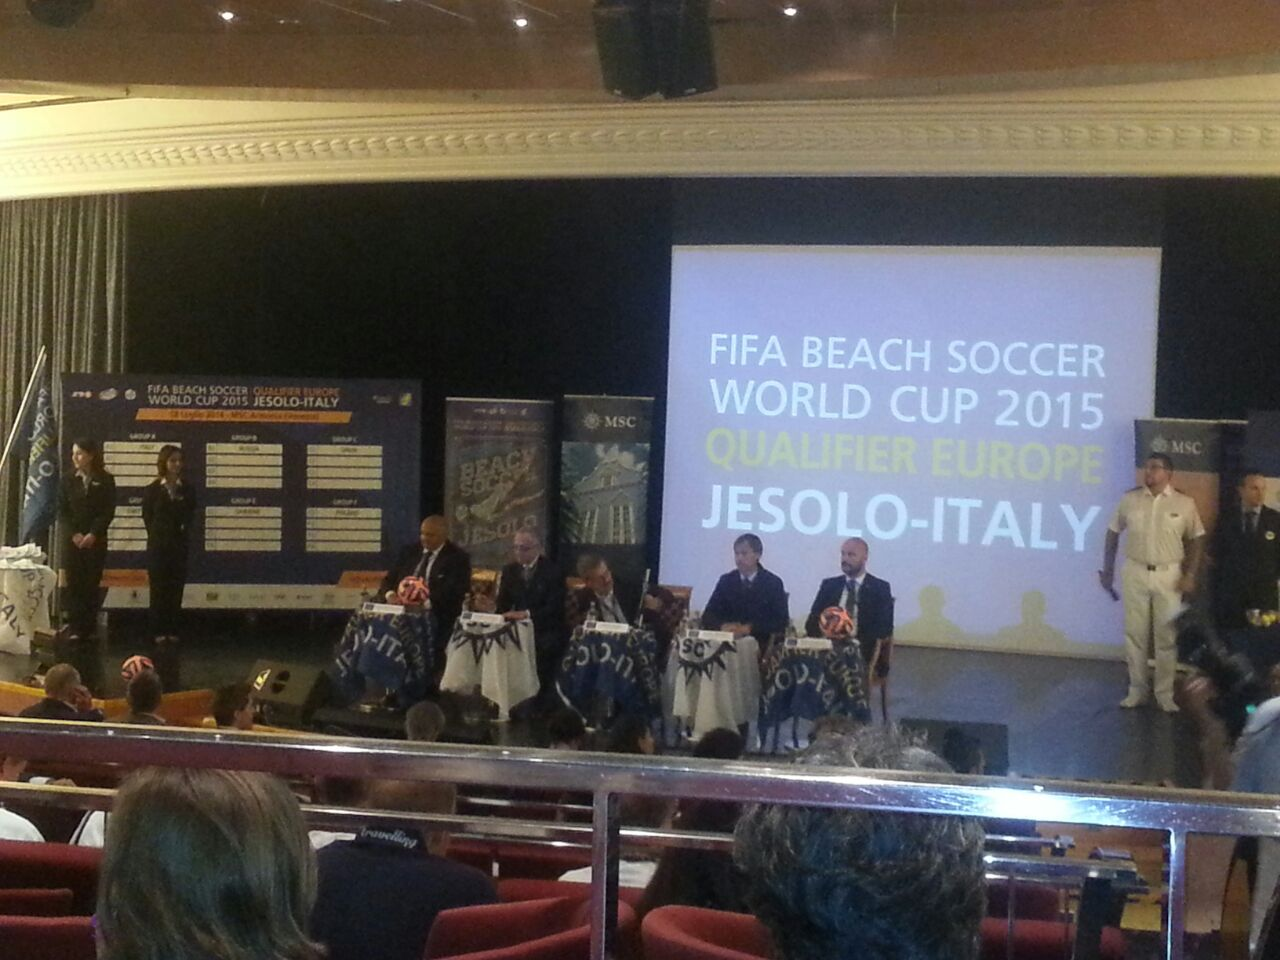 18/7/14 MSC Armonia -  Evento Fifa Beach soccer world cup-diretta-liveboat-msc-armonia-fifa-event-3-jpg